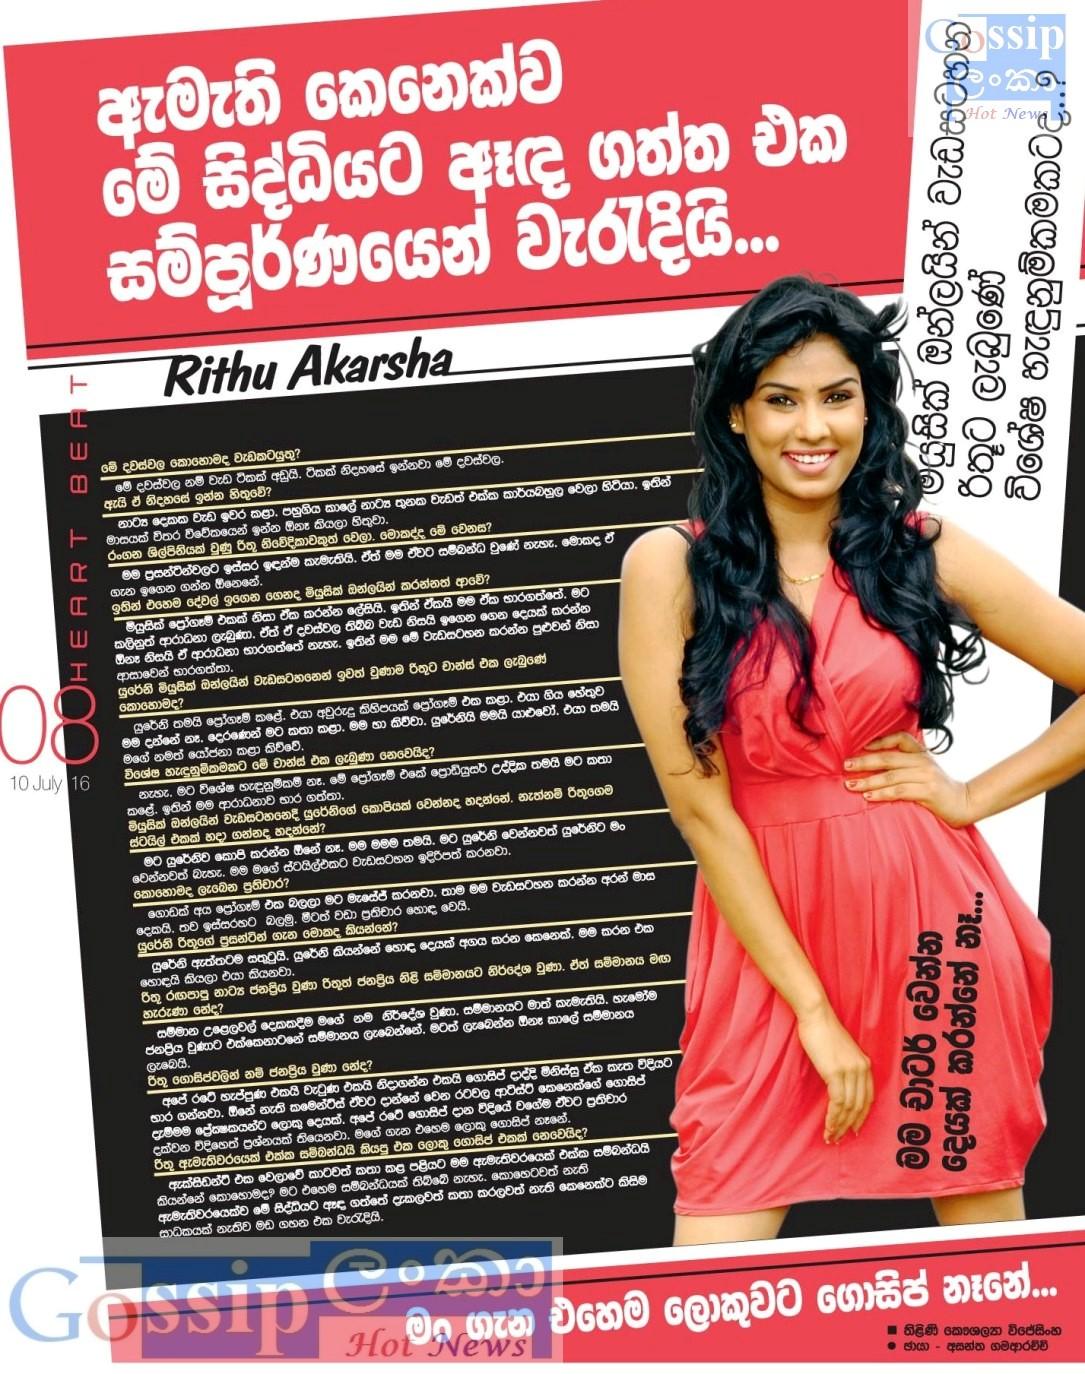 Chat With Sri Lankan Teledrama Actress Rithu Akarsha